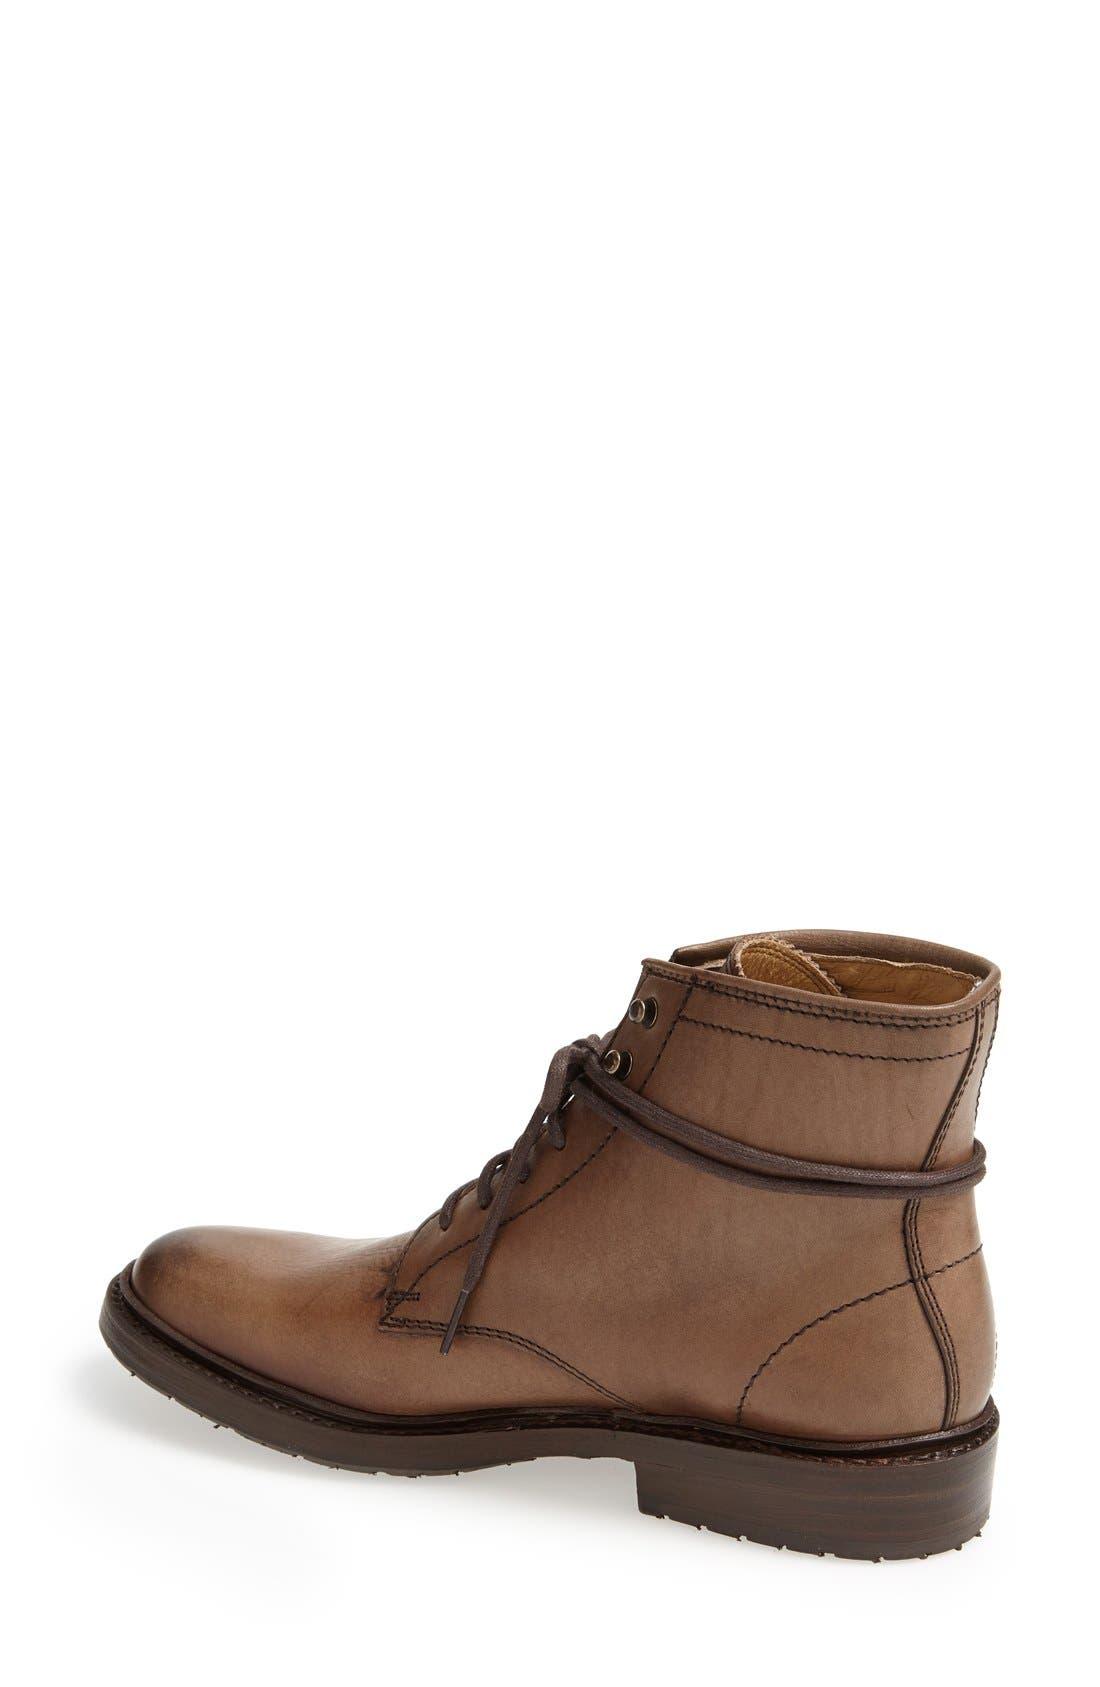 Alternate Image 2  - Frye 'James' Lug Lace-Up Boot (Women)